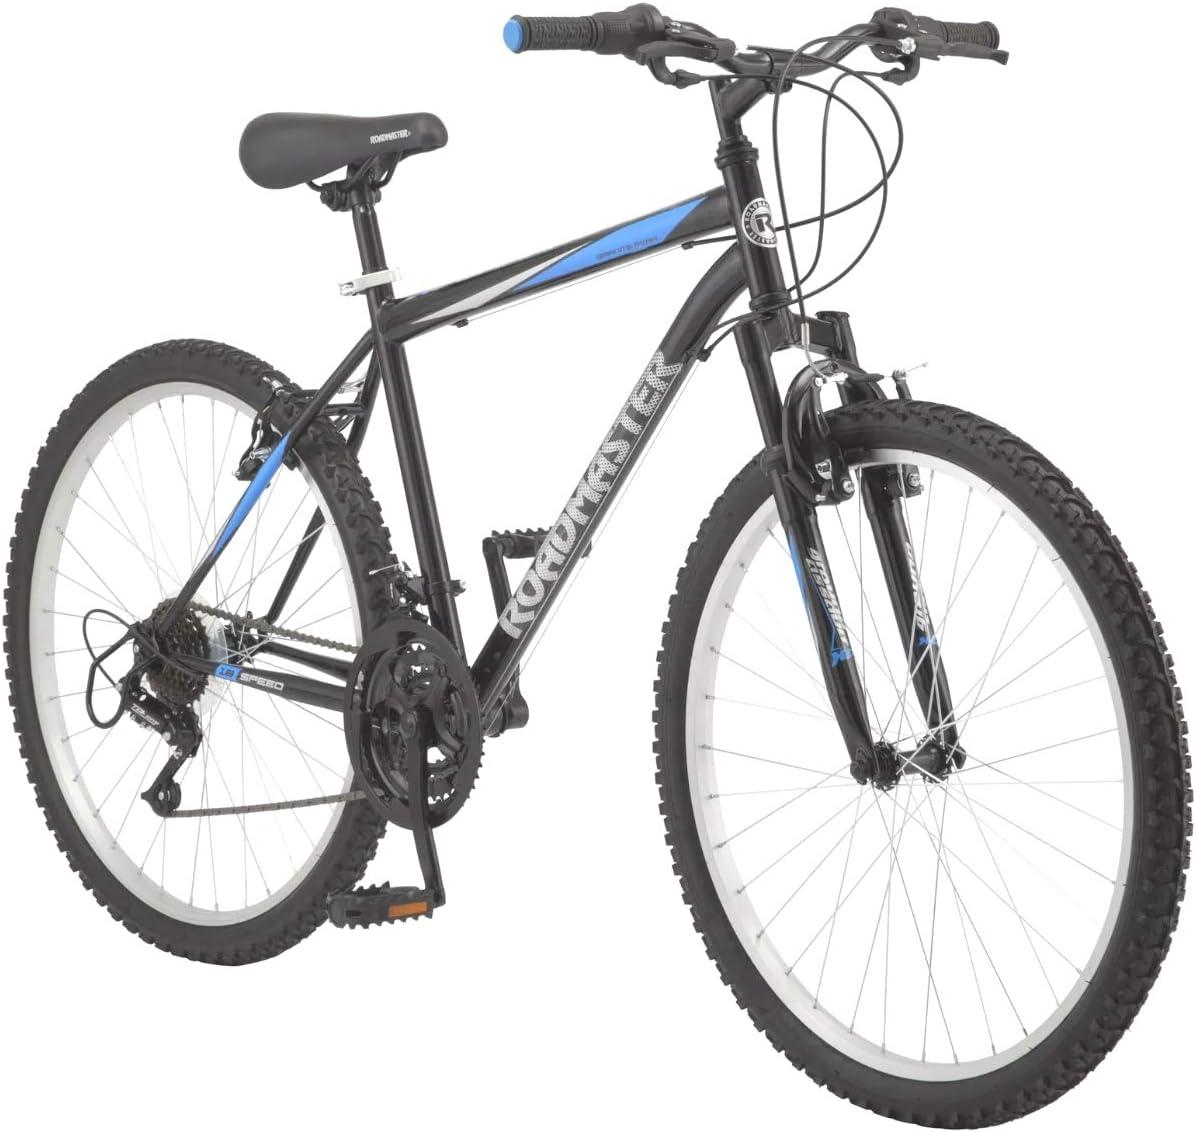 "Roadmaster 26"" Granite Peak Men's Mountain Bike"